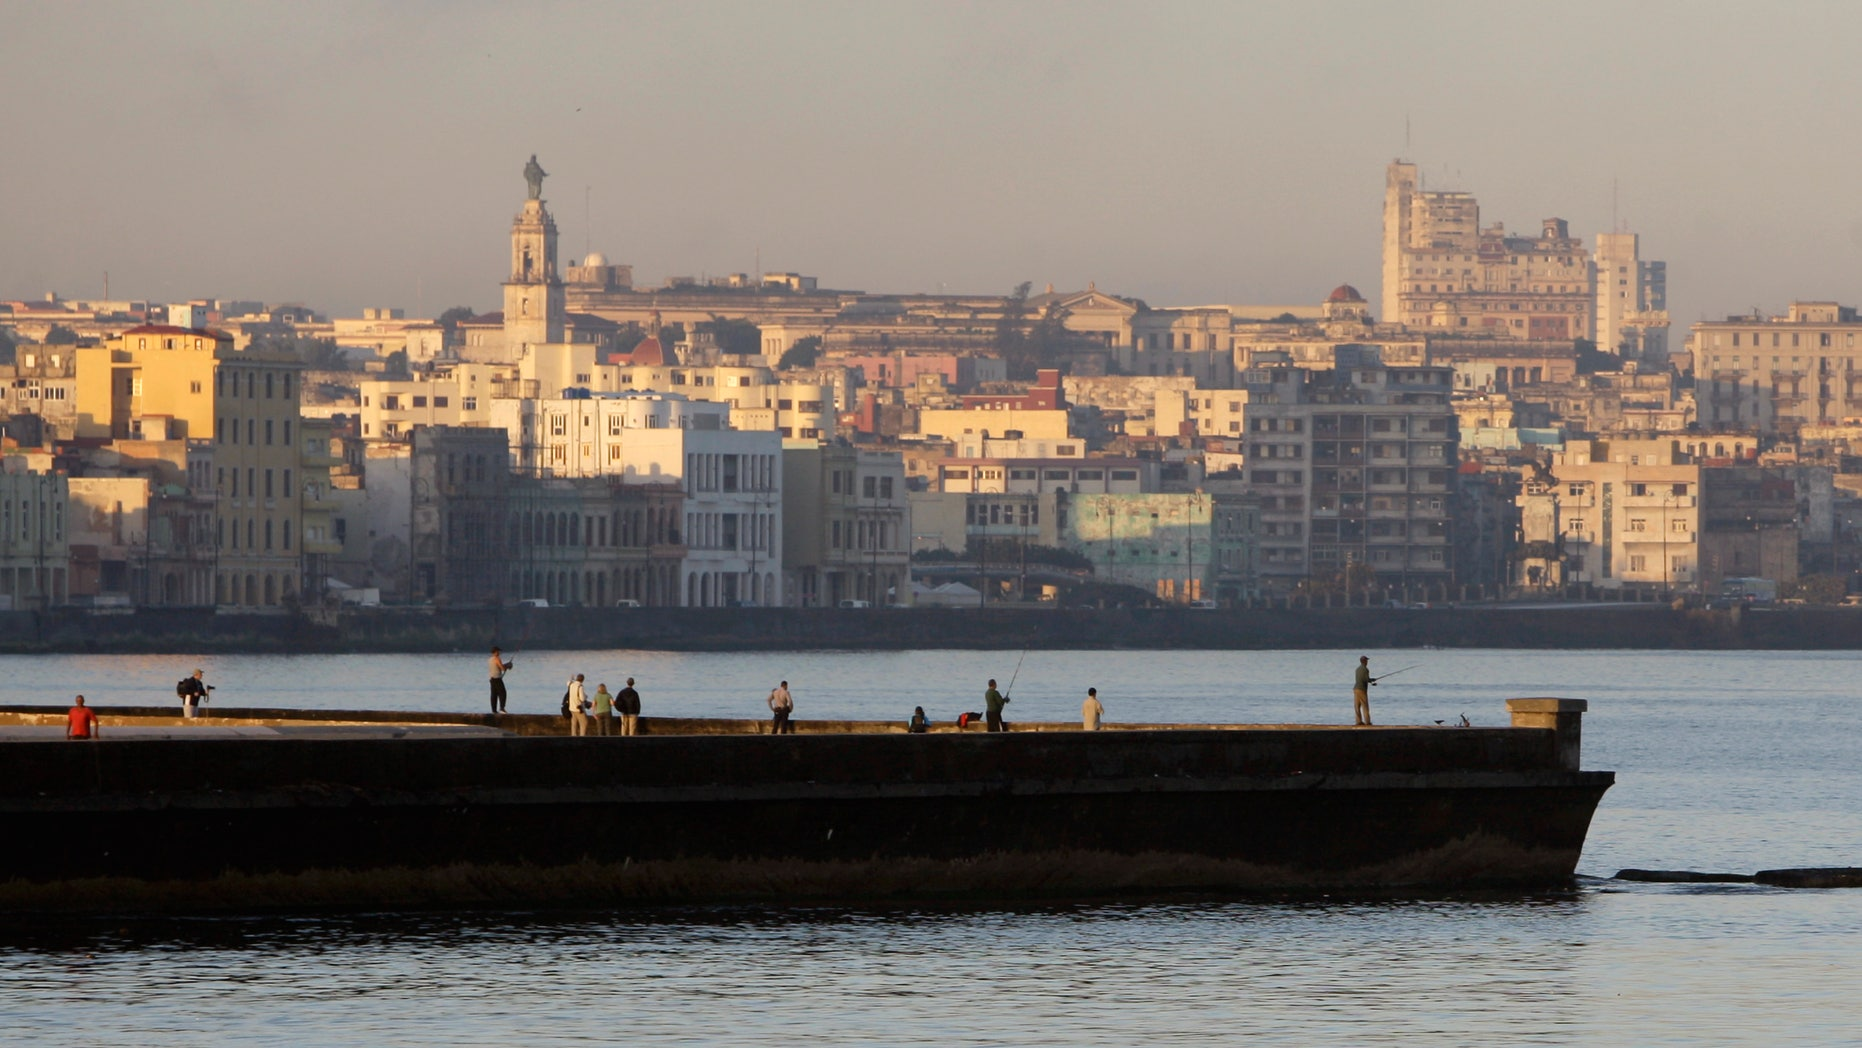 People fish from a dock in Havana Bay, Cuba, Tuesday Feb. 7, 2012. (AP Photo/Franklin Reyes)